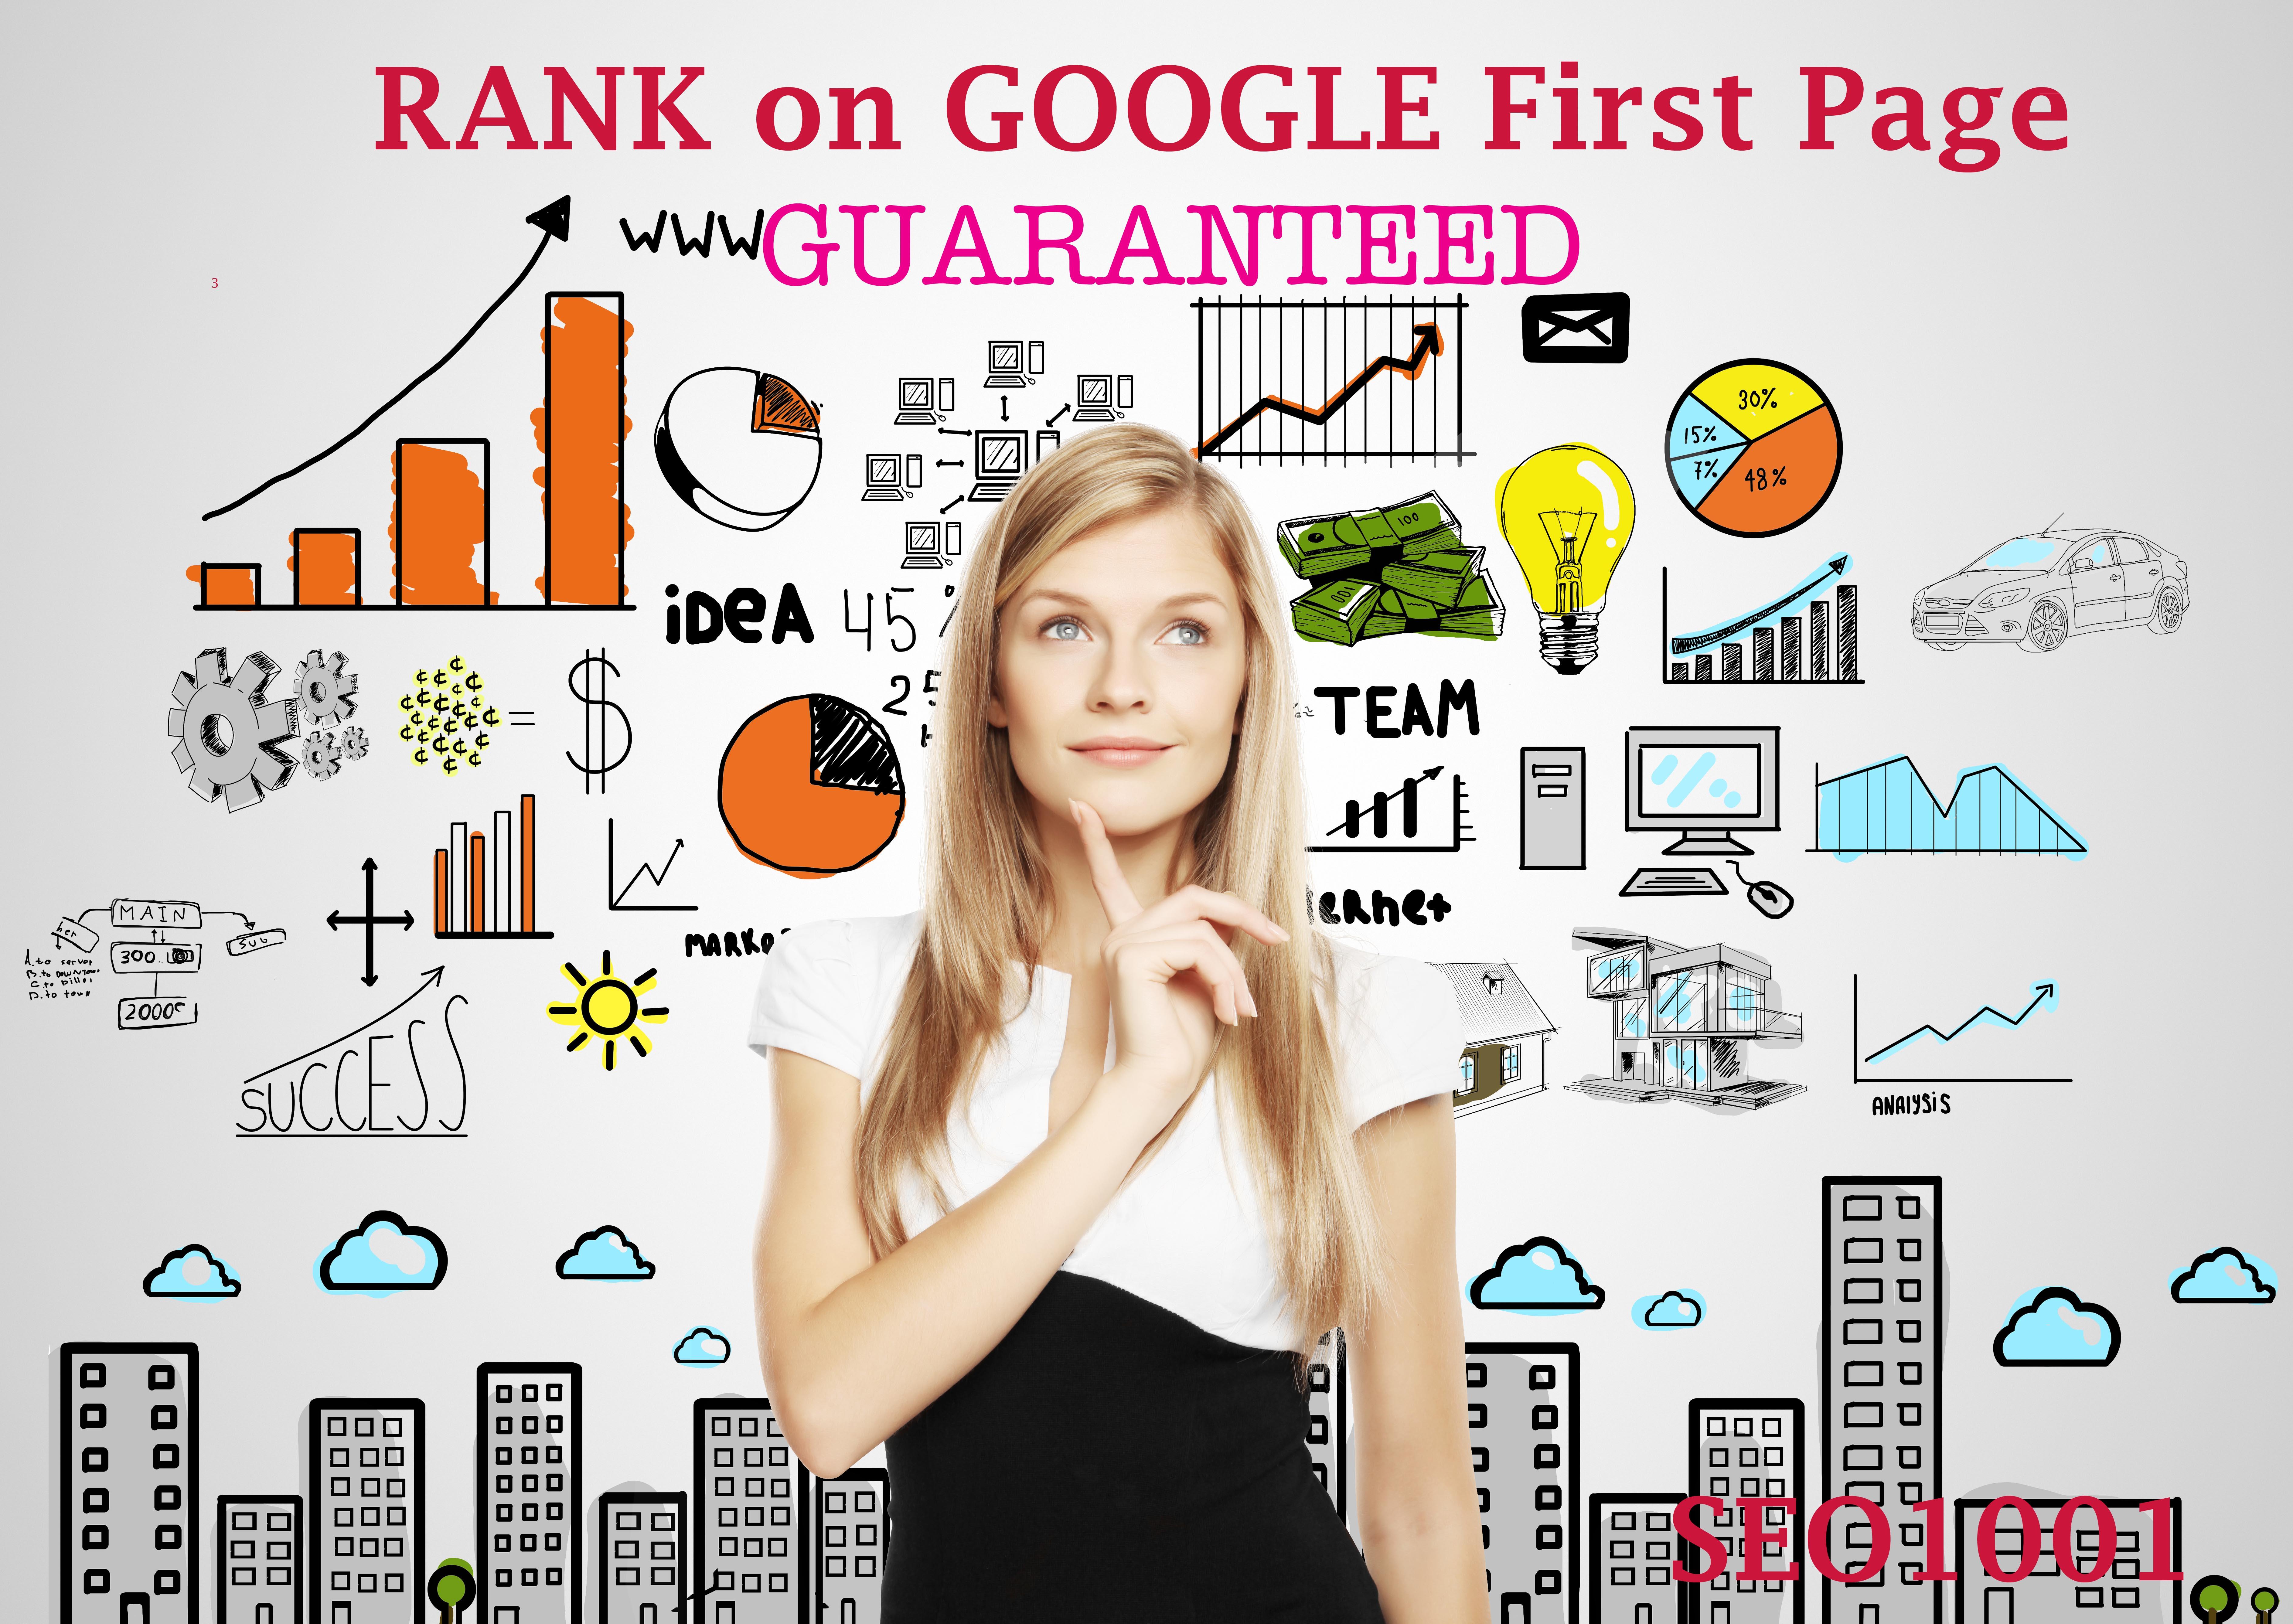 POWERFUL-RANK-on-Google-First-Page-GUARANTEED